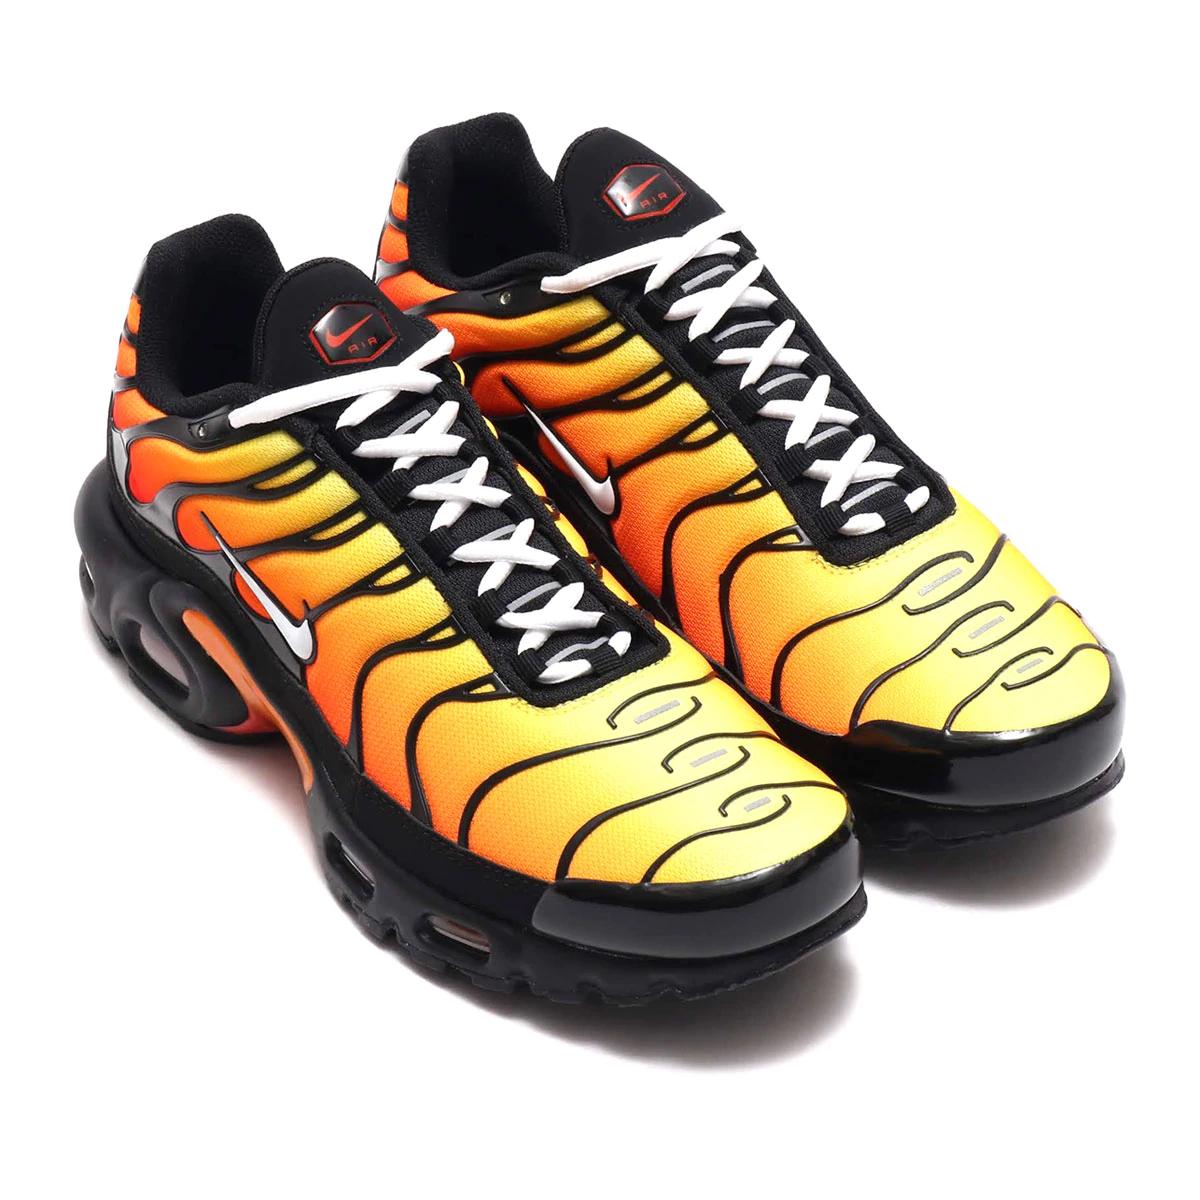 sale retailer 142f5 d3f0b On Sale: Nike Air Max Plus